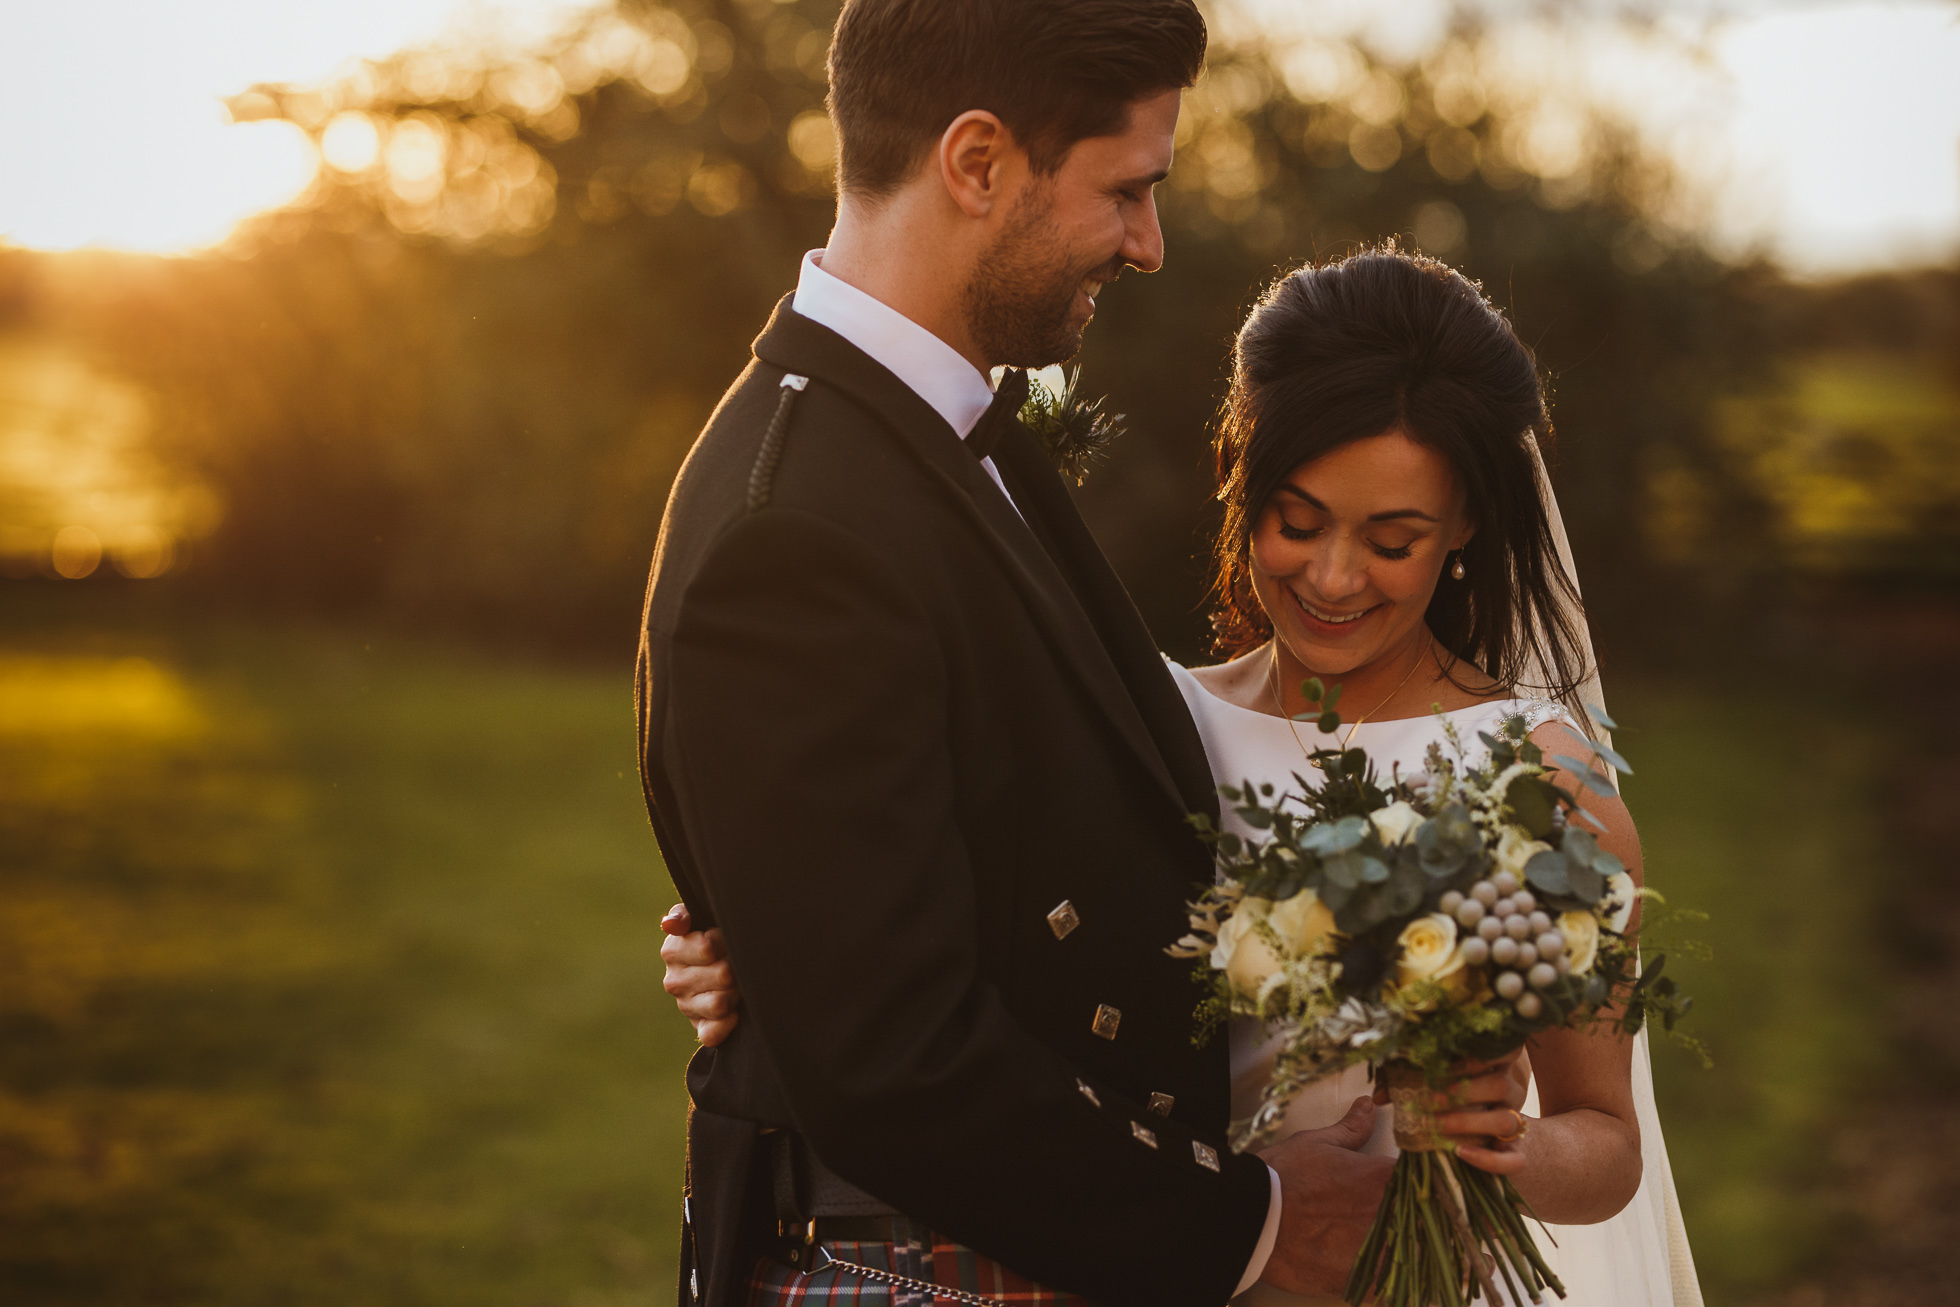 hornington_manor_wedding_photographer-52.jpg